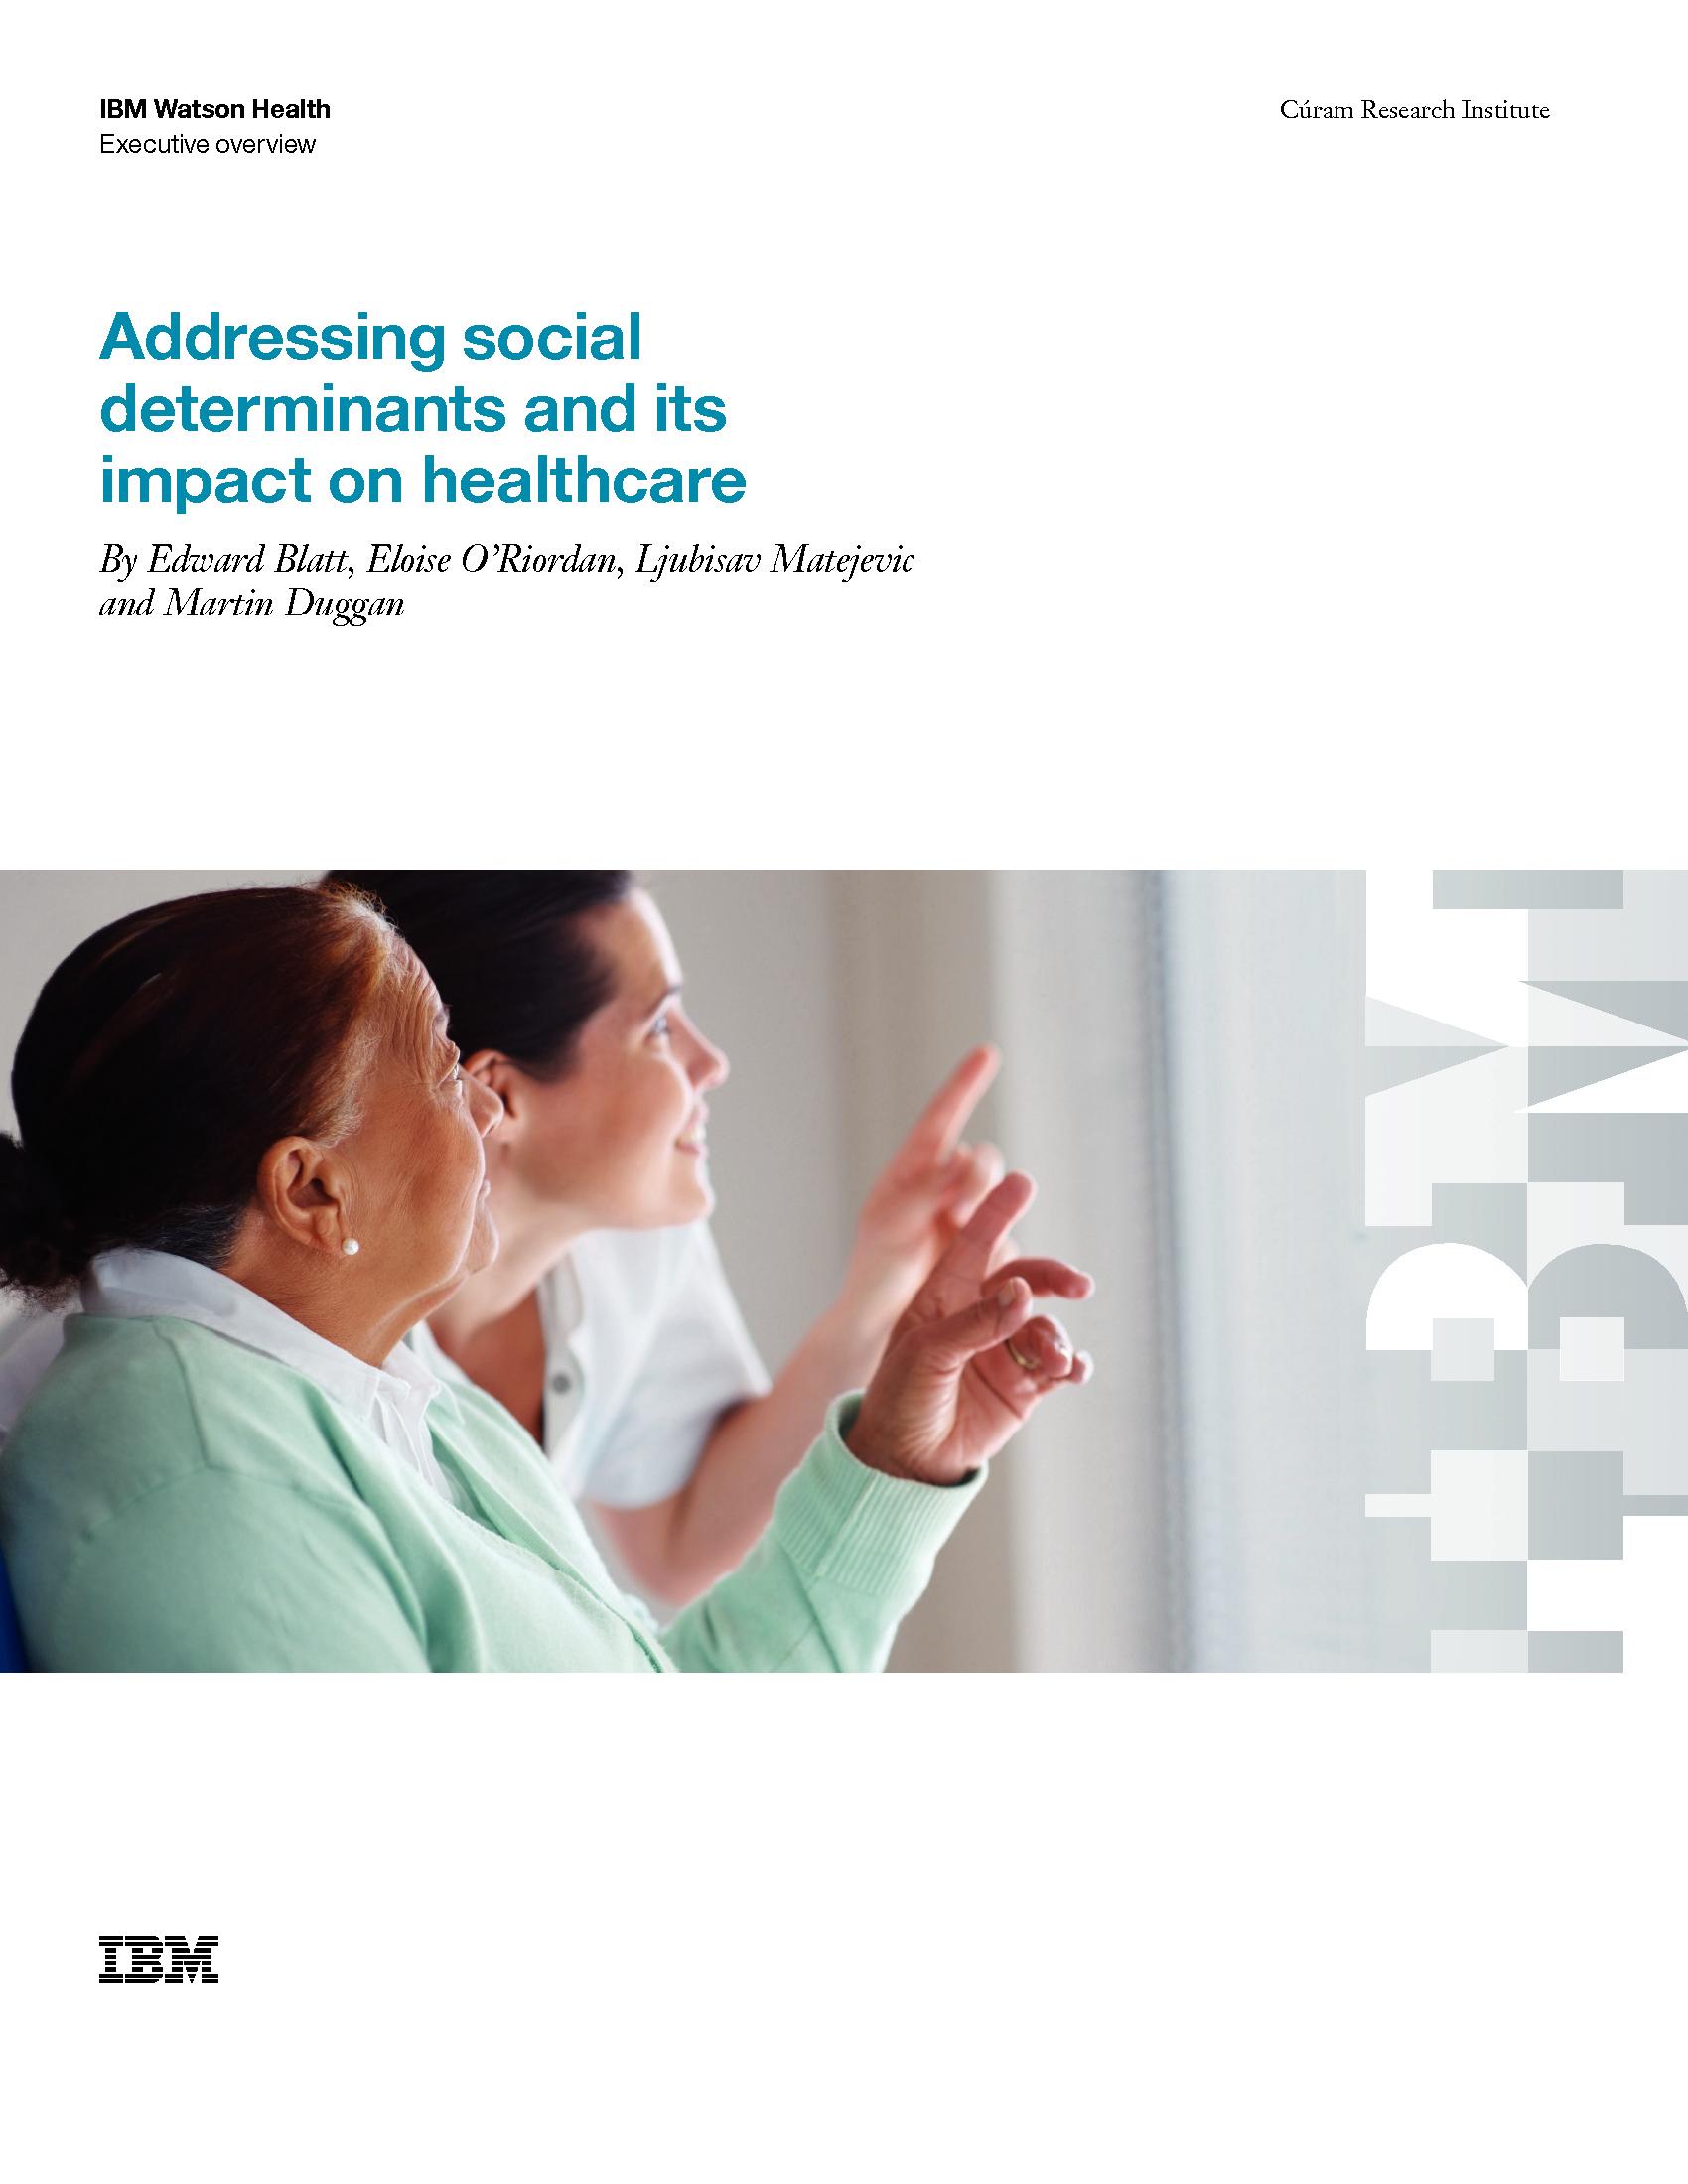 GOV - IBM - Smarter Microsite 2018 - Addressing social determinants